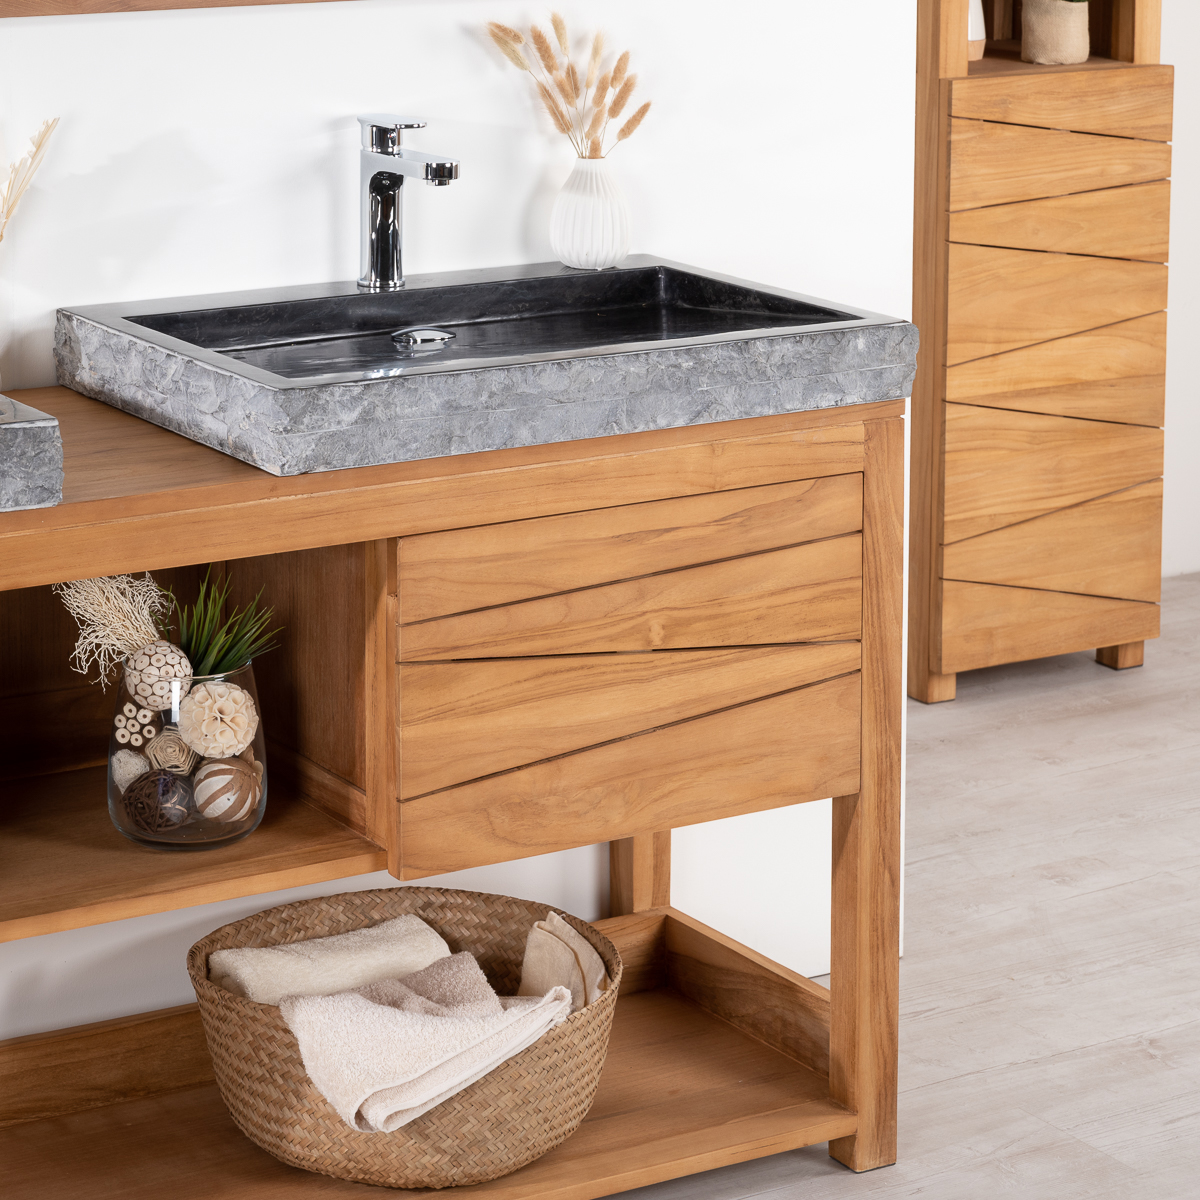 meuble sous vasque double vasque en bois teck massif 2 vasques en marbre cosy naturel. Black Bedroom Furniture Sets. Home Design Ideas